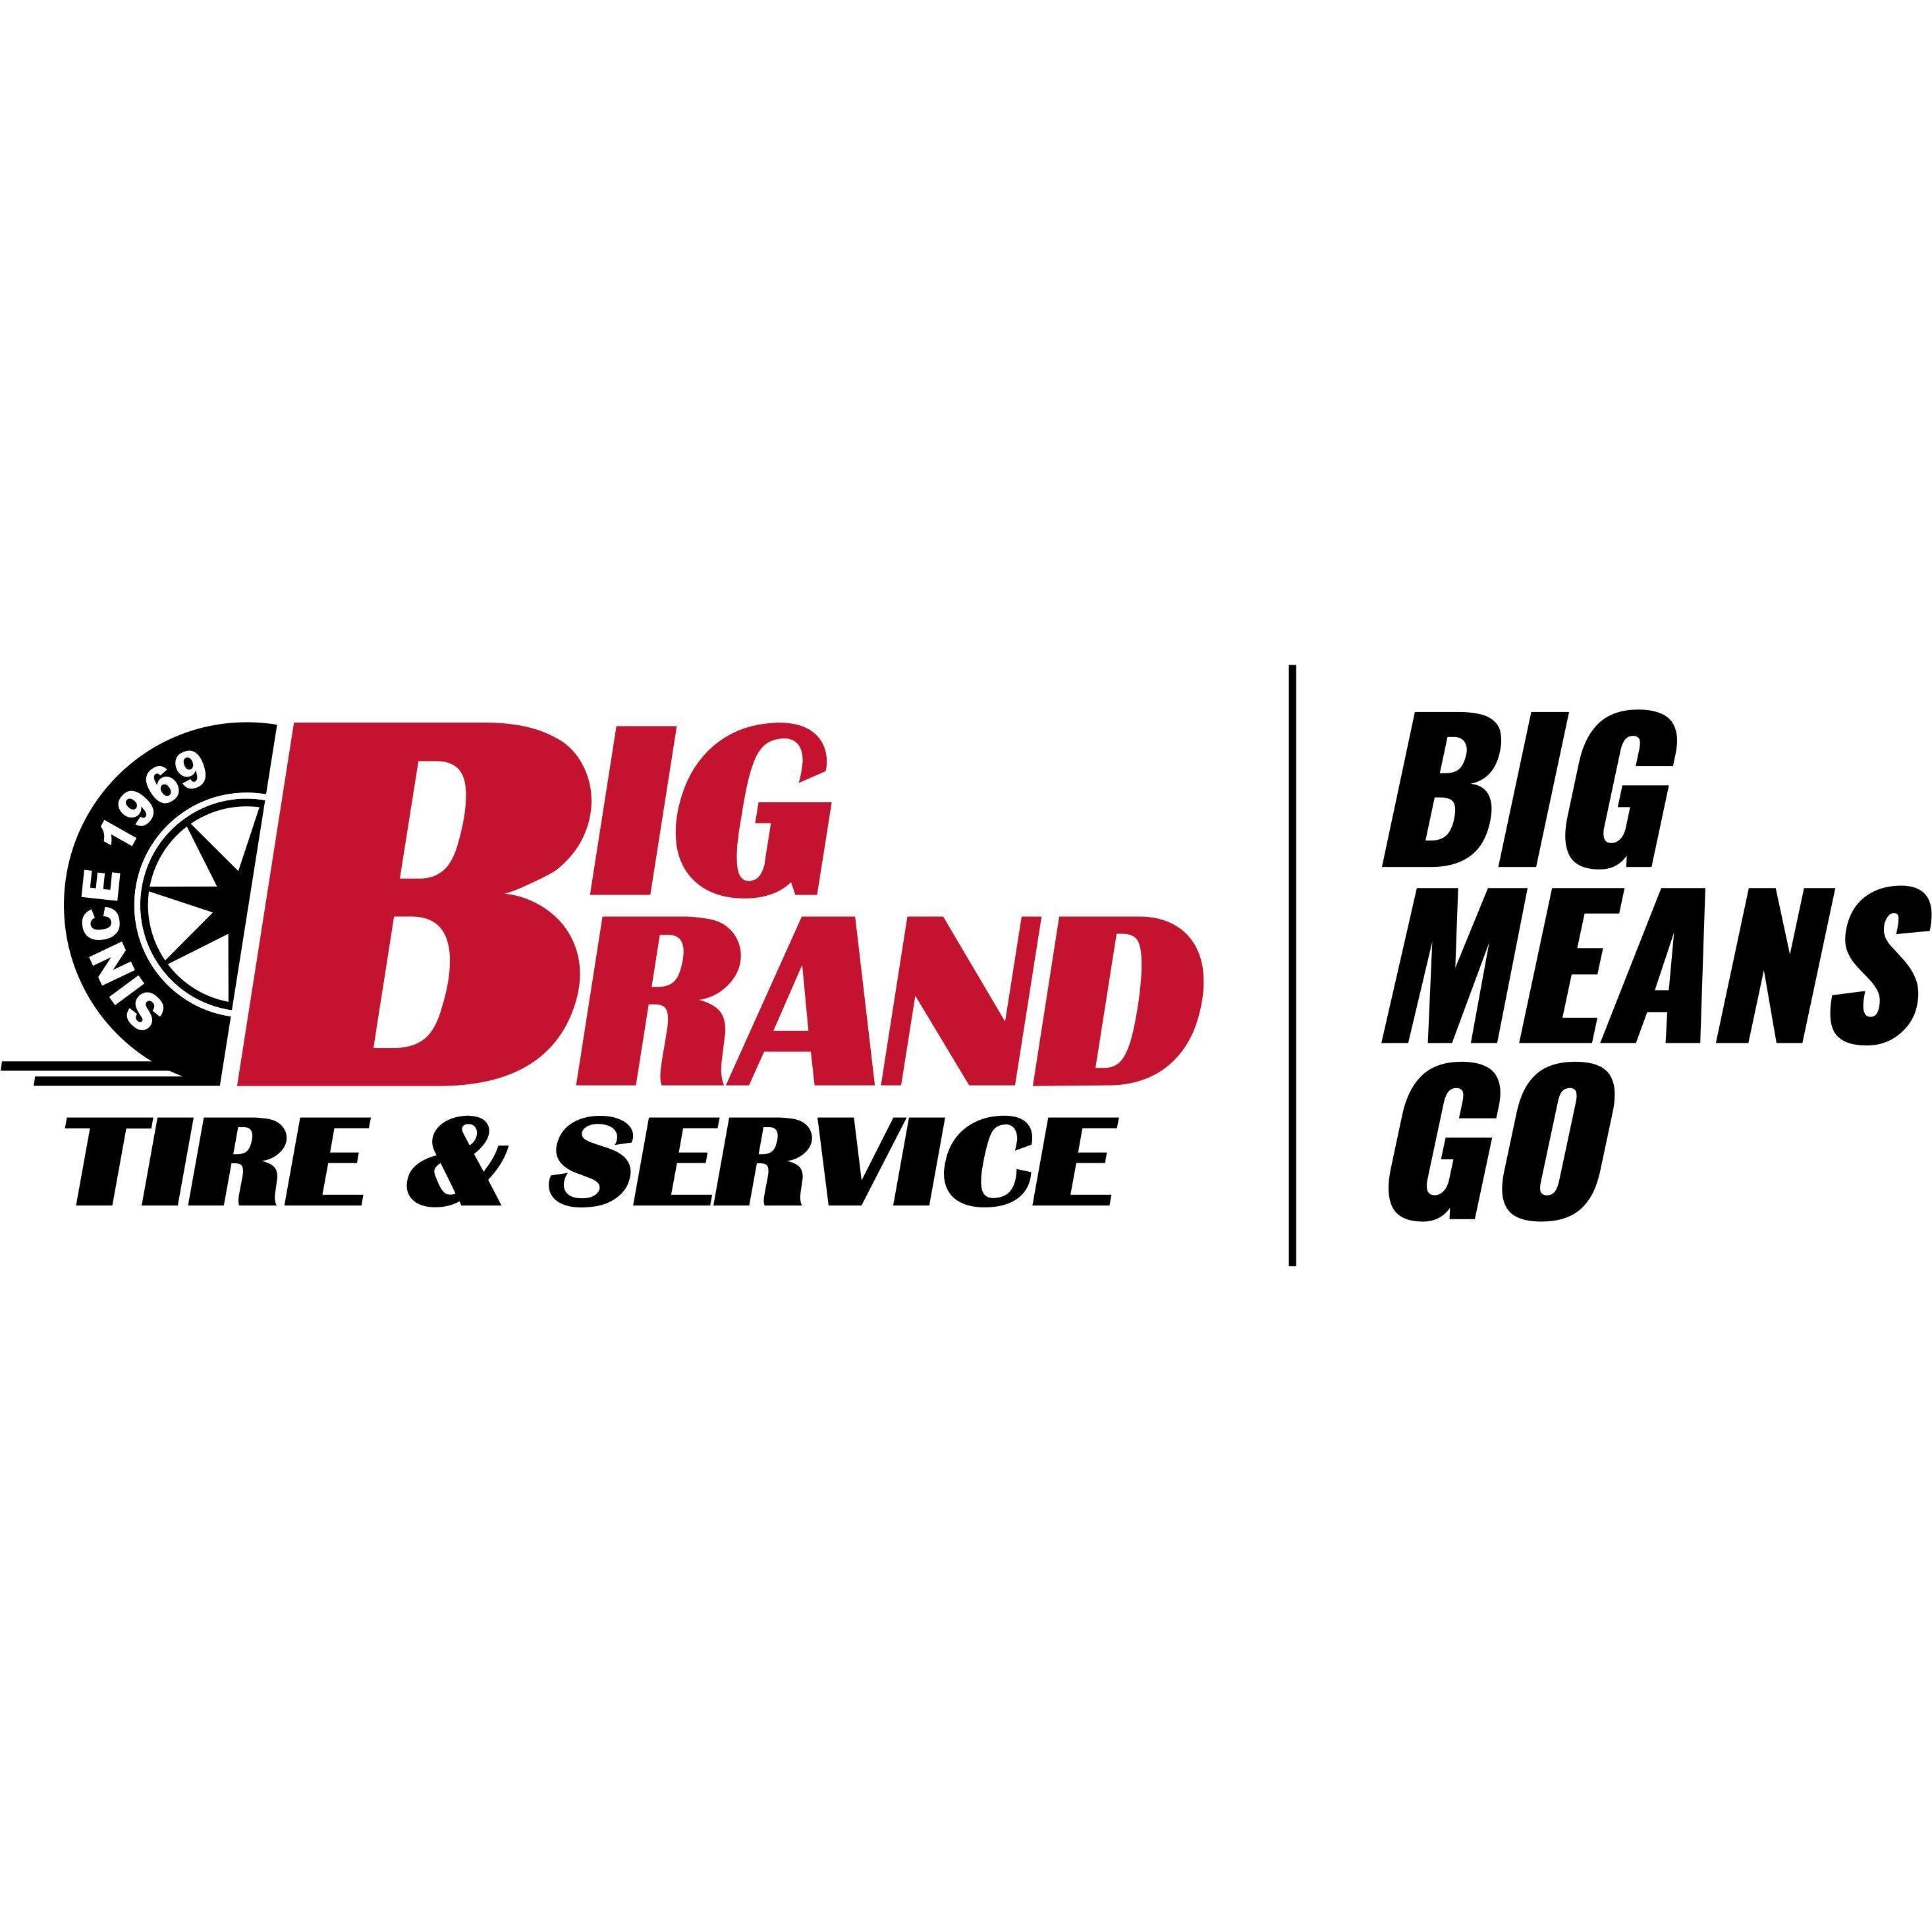 Big Brand Tire & Service image 1